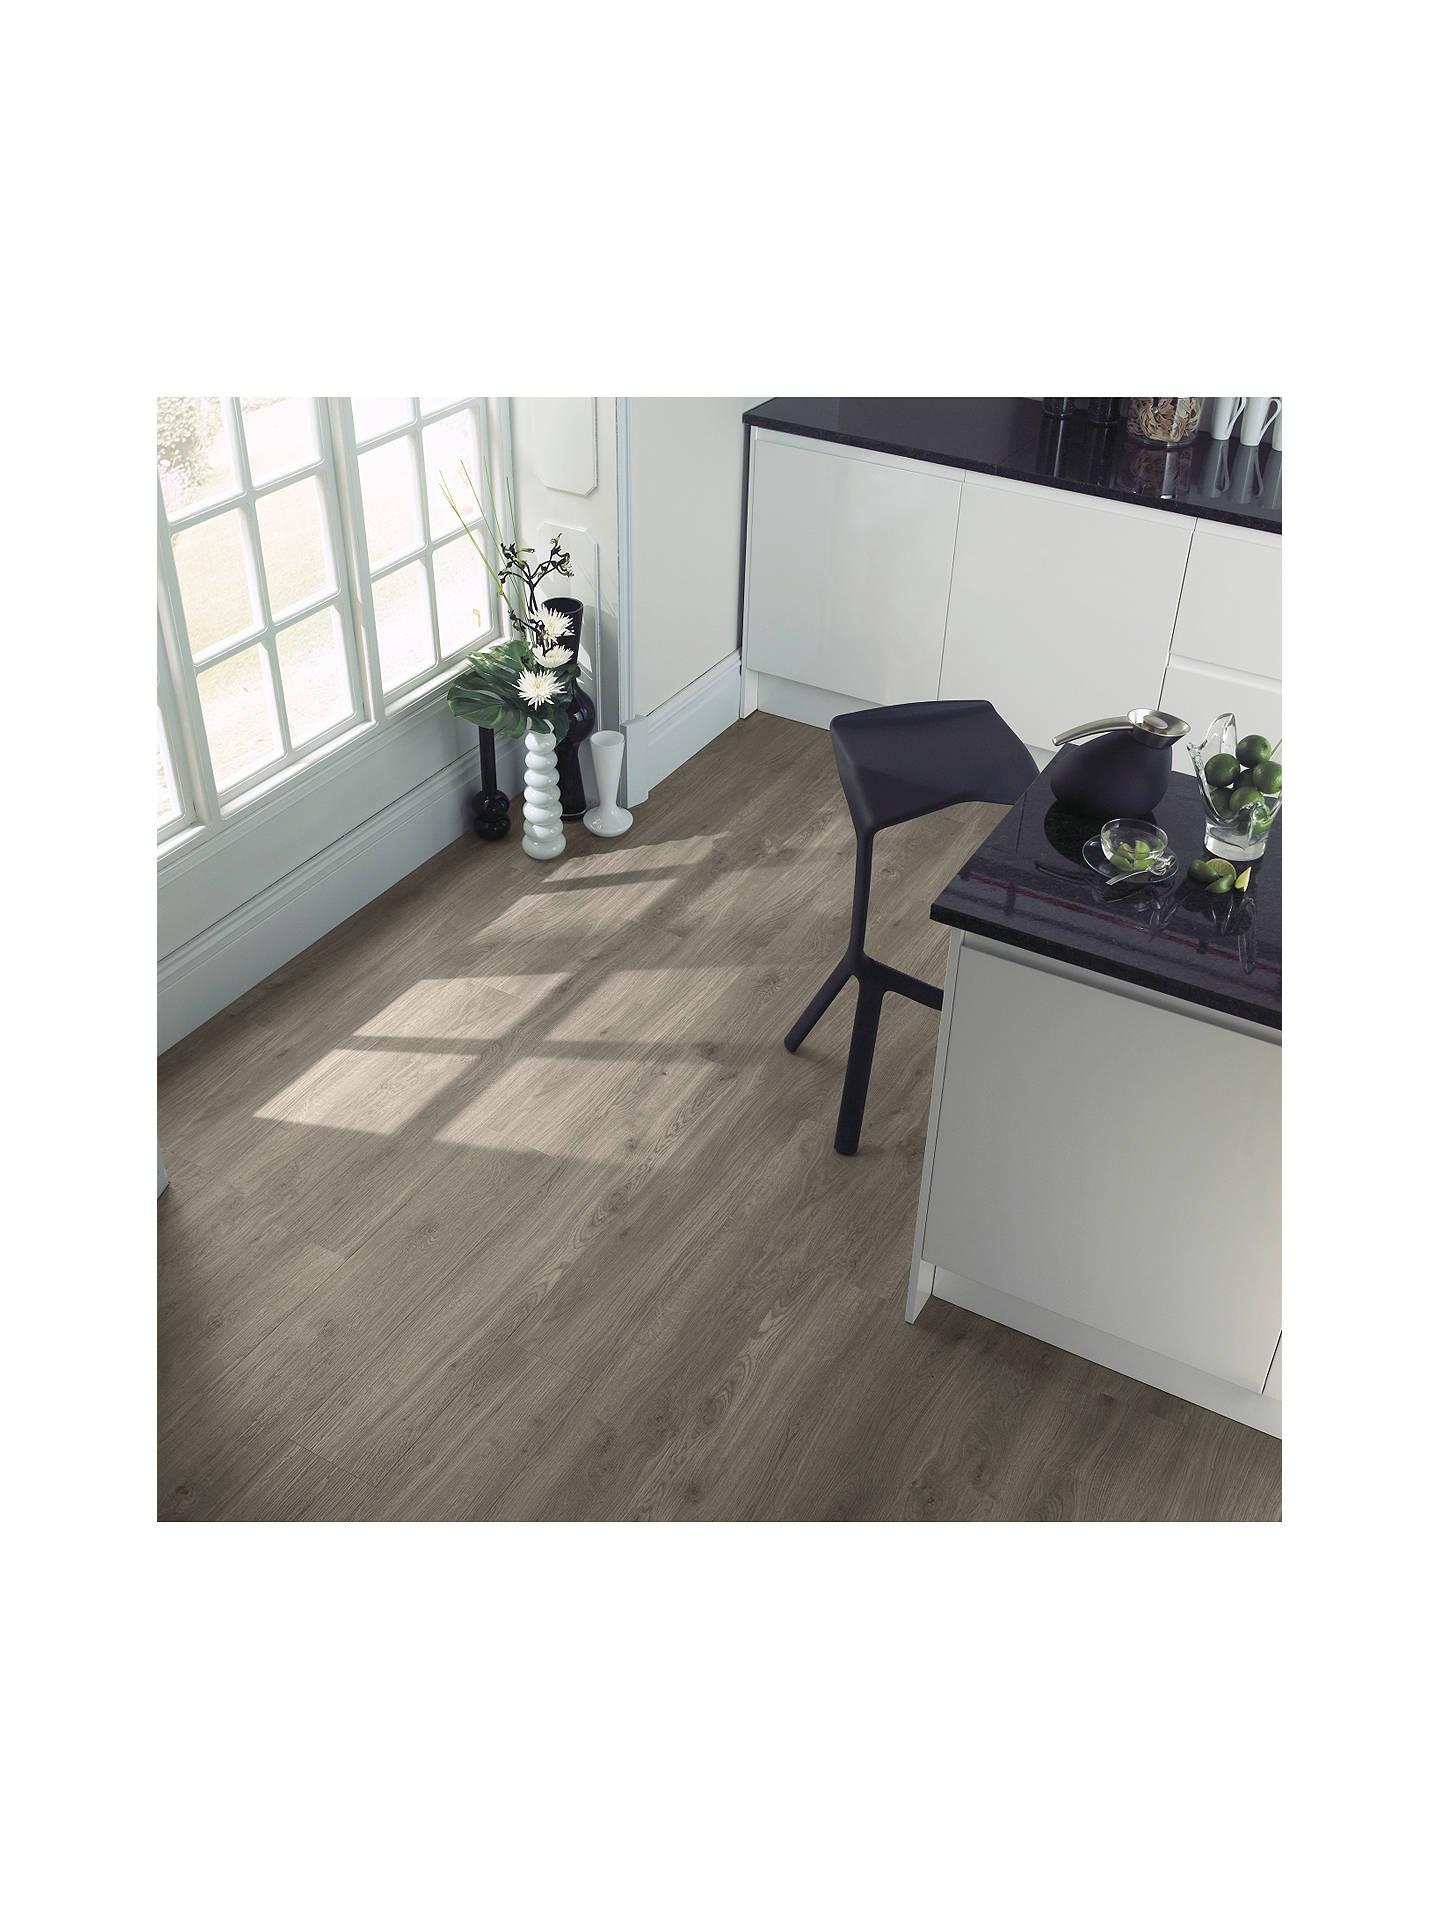 Amtico Spacia Wood Luxury Vinyl Tile Flooring At John Lewis Partners